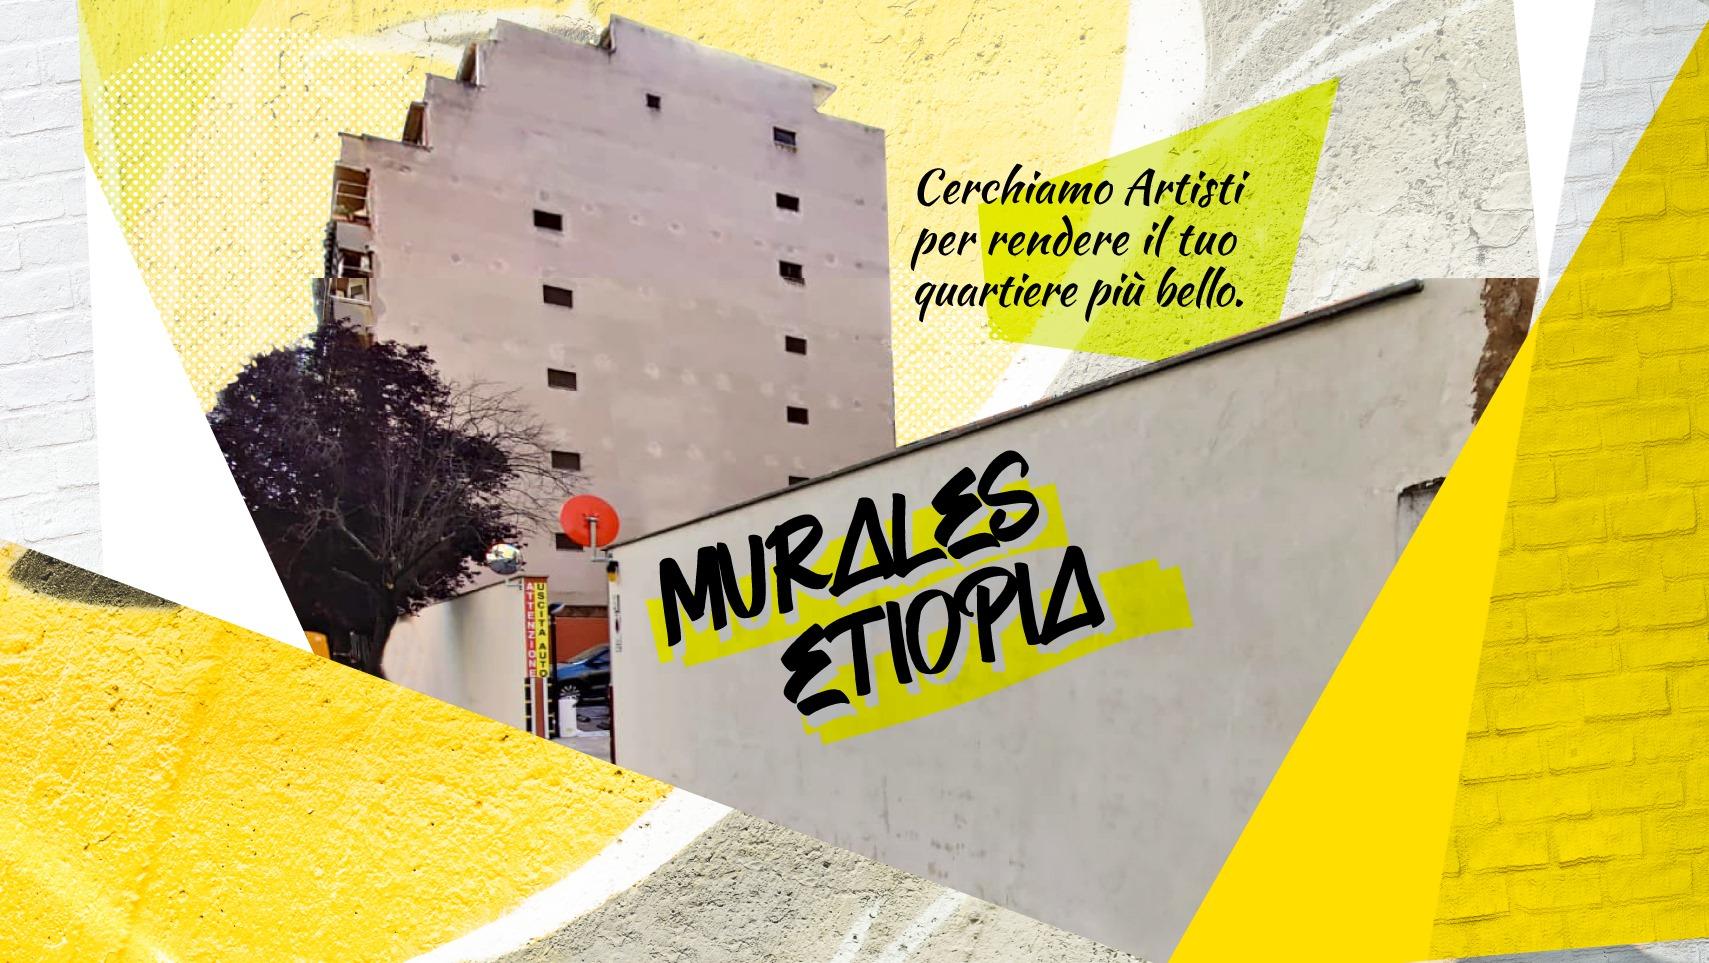 Murales Etiopia, concorso internazionale per street artist